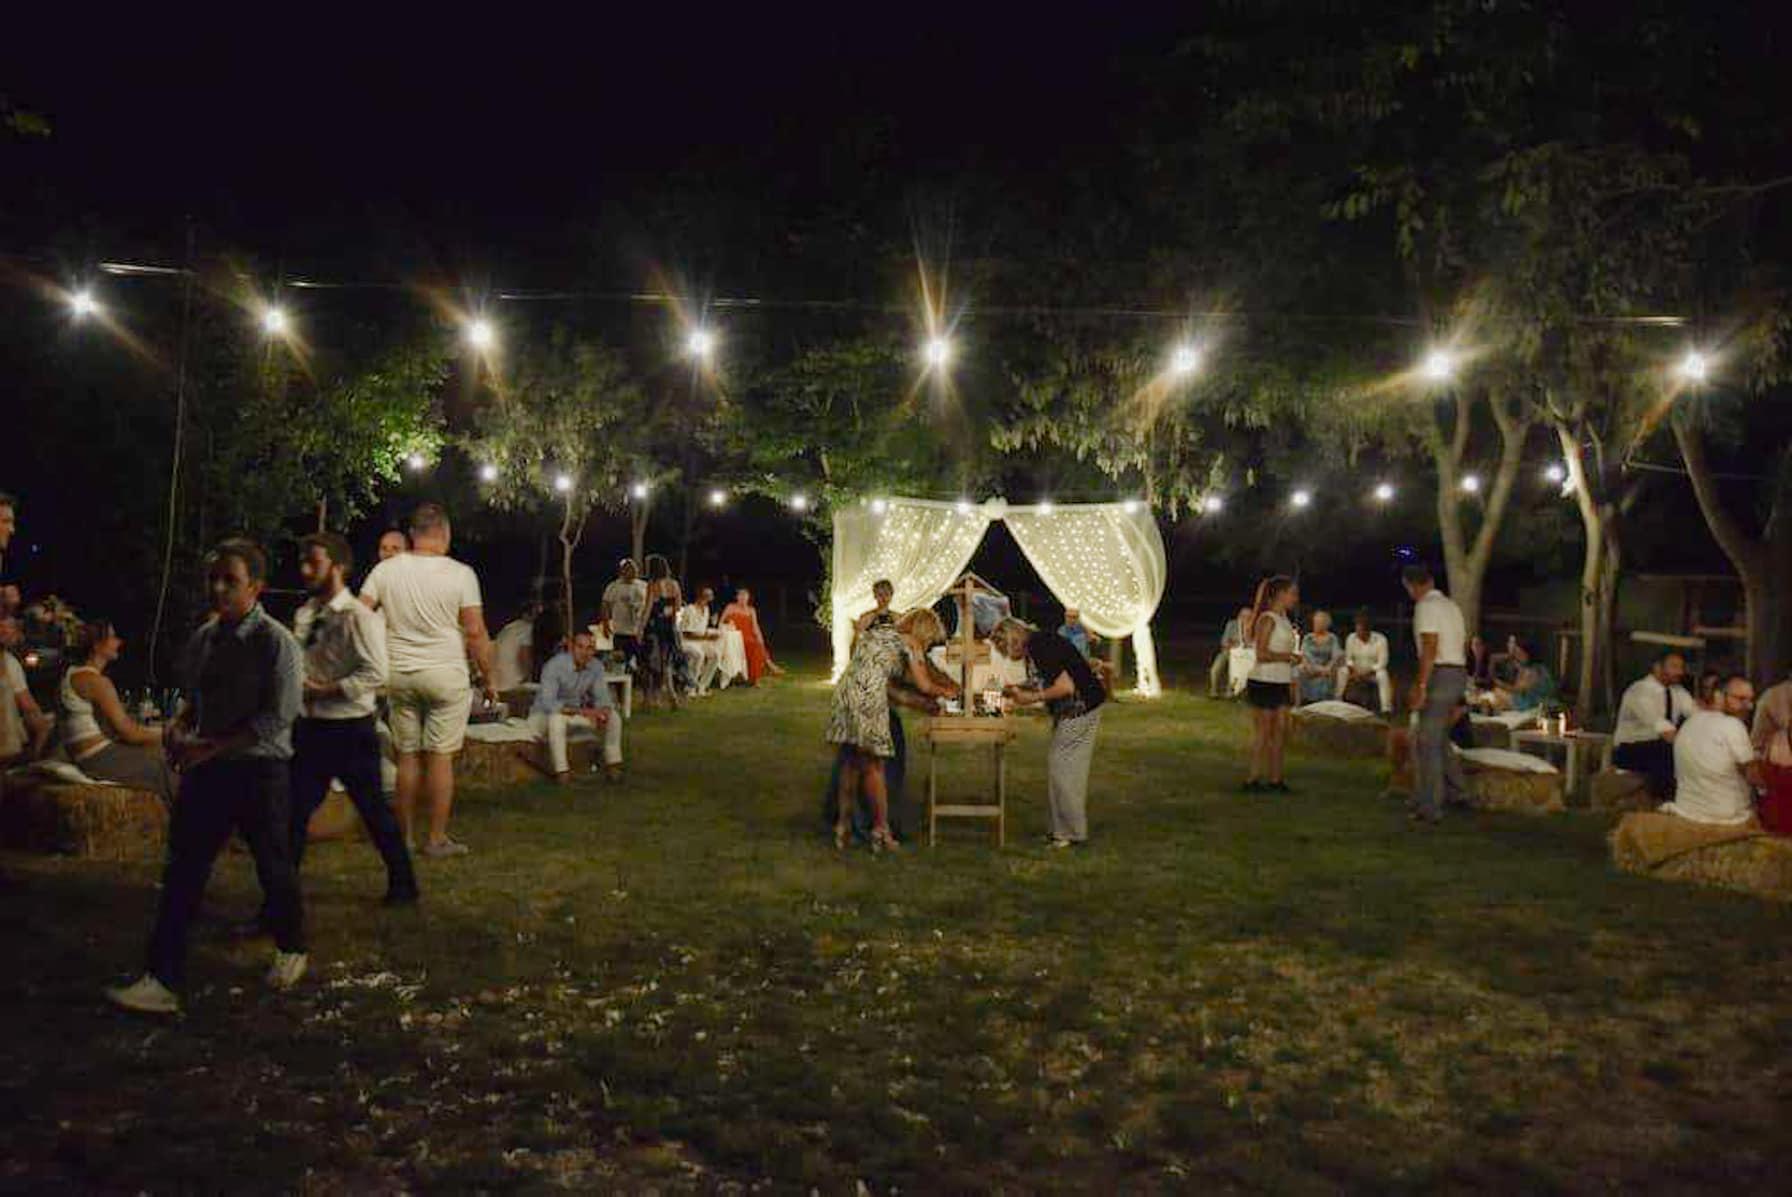 allestimento matrimonio semplice in giardino